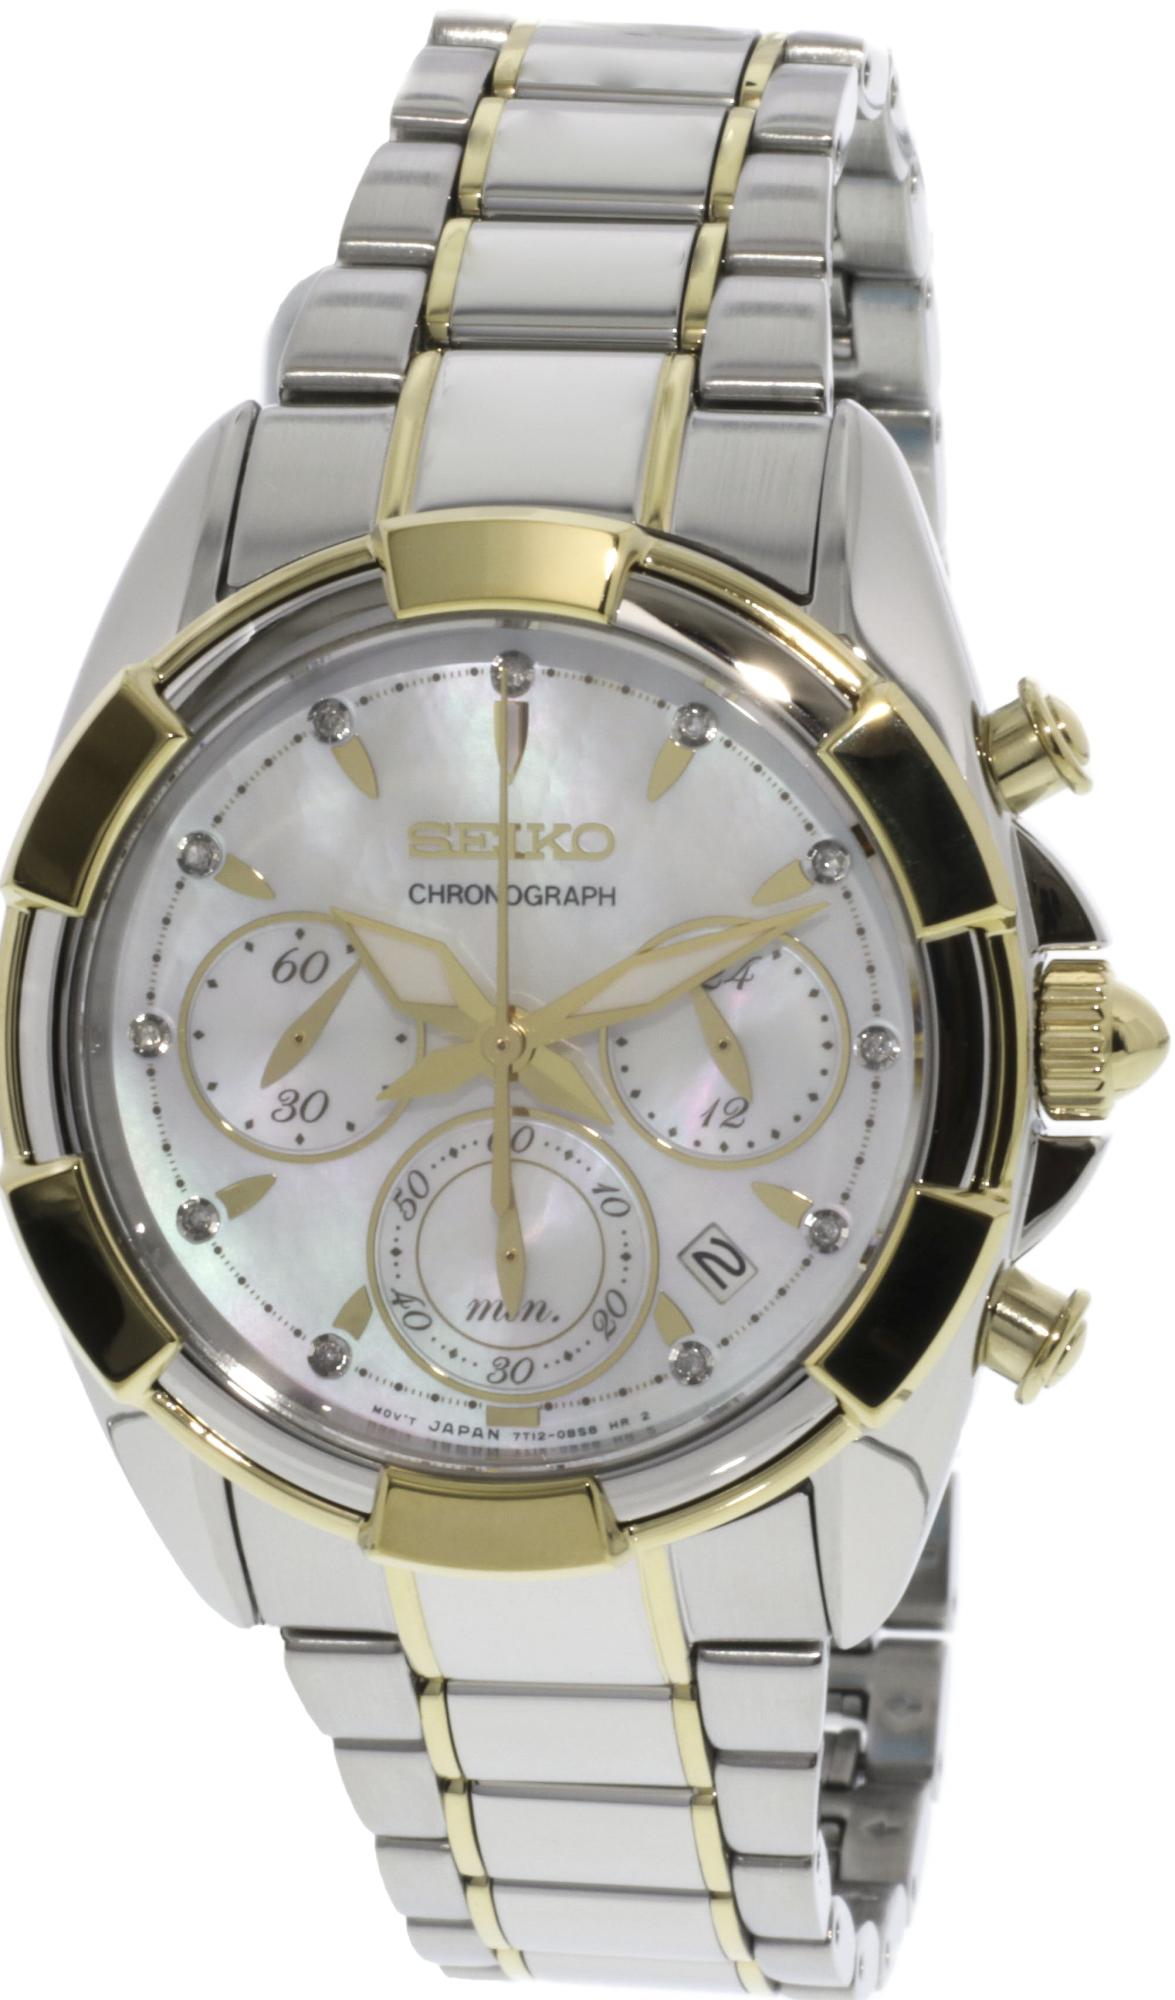 Seiko_Women's_SRW808_Silver_Stainless-Steel_Japanese_Chronograph_Fashion_Watch